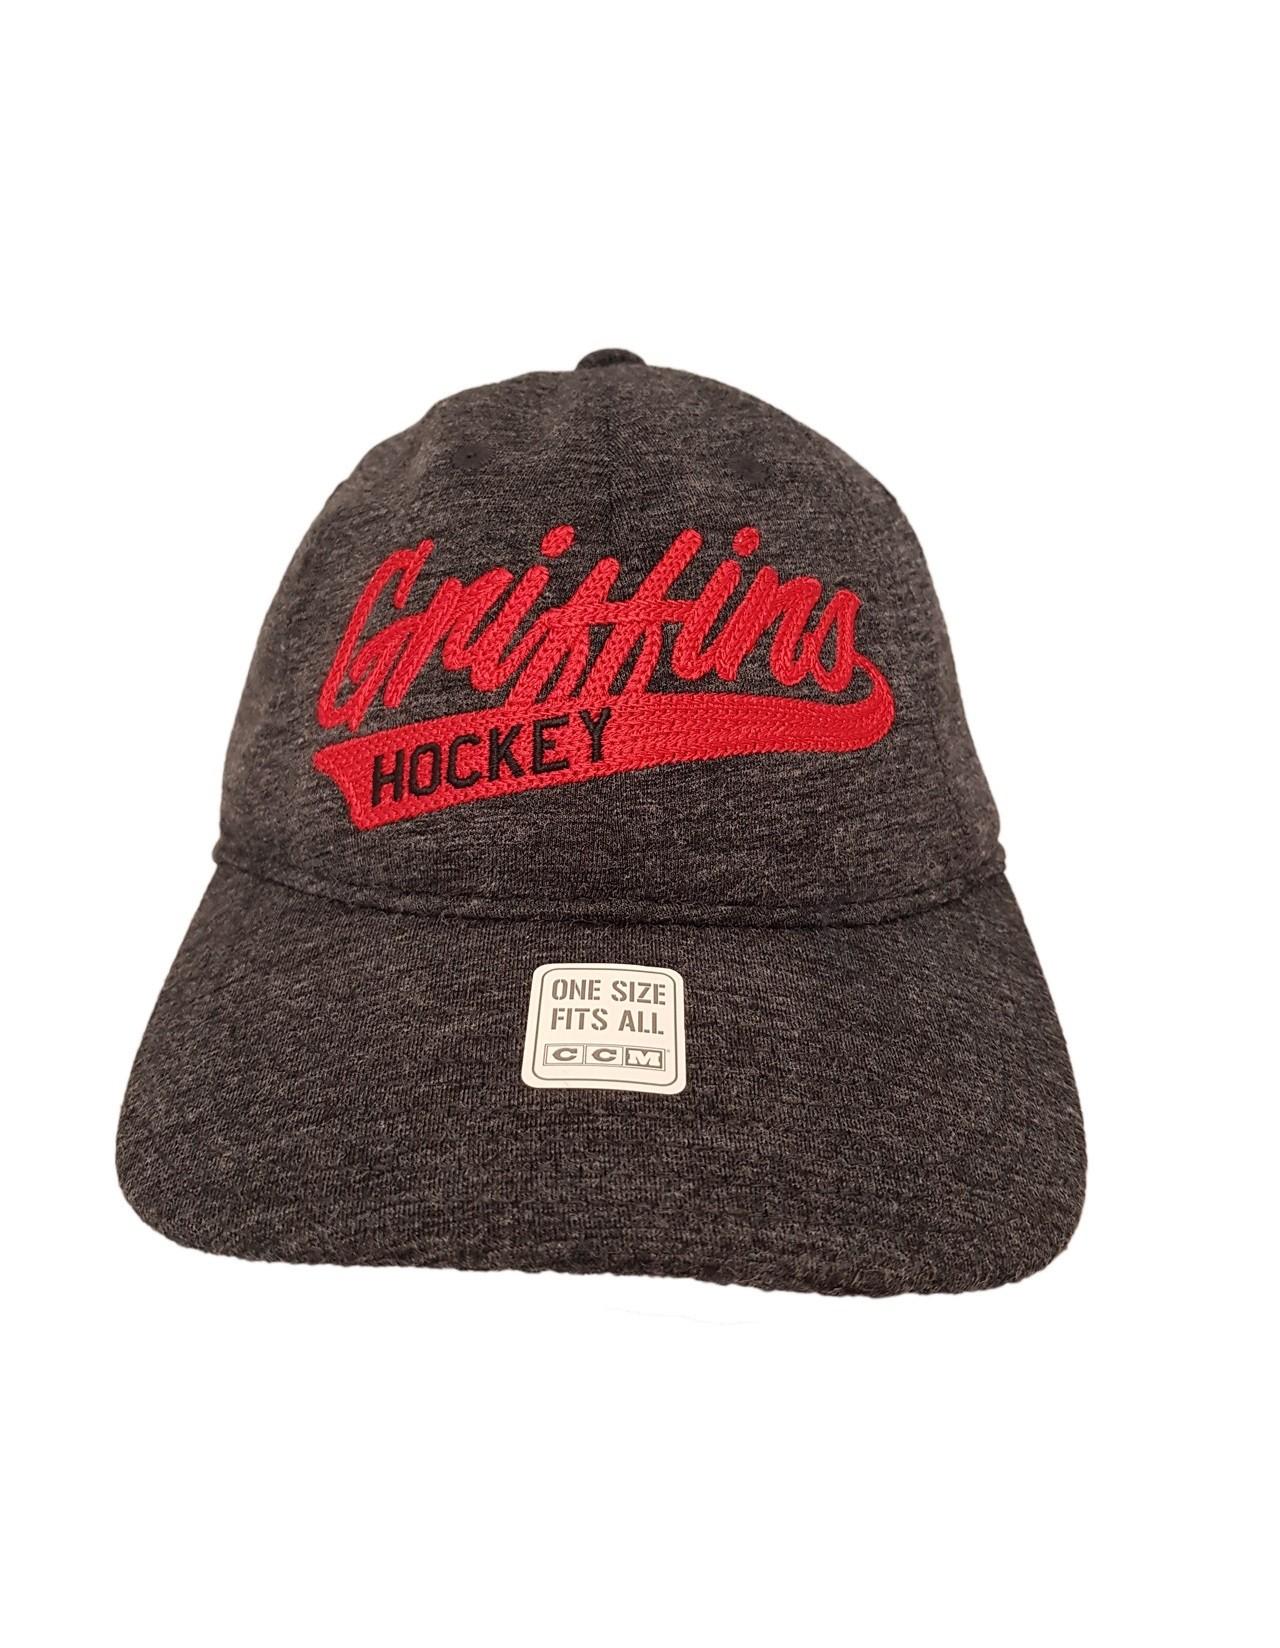 CCM Griffins Hockey Slouch Adjustable Vasaras Cepure